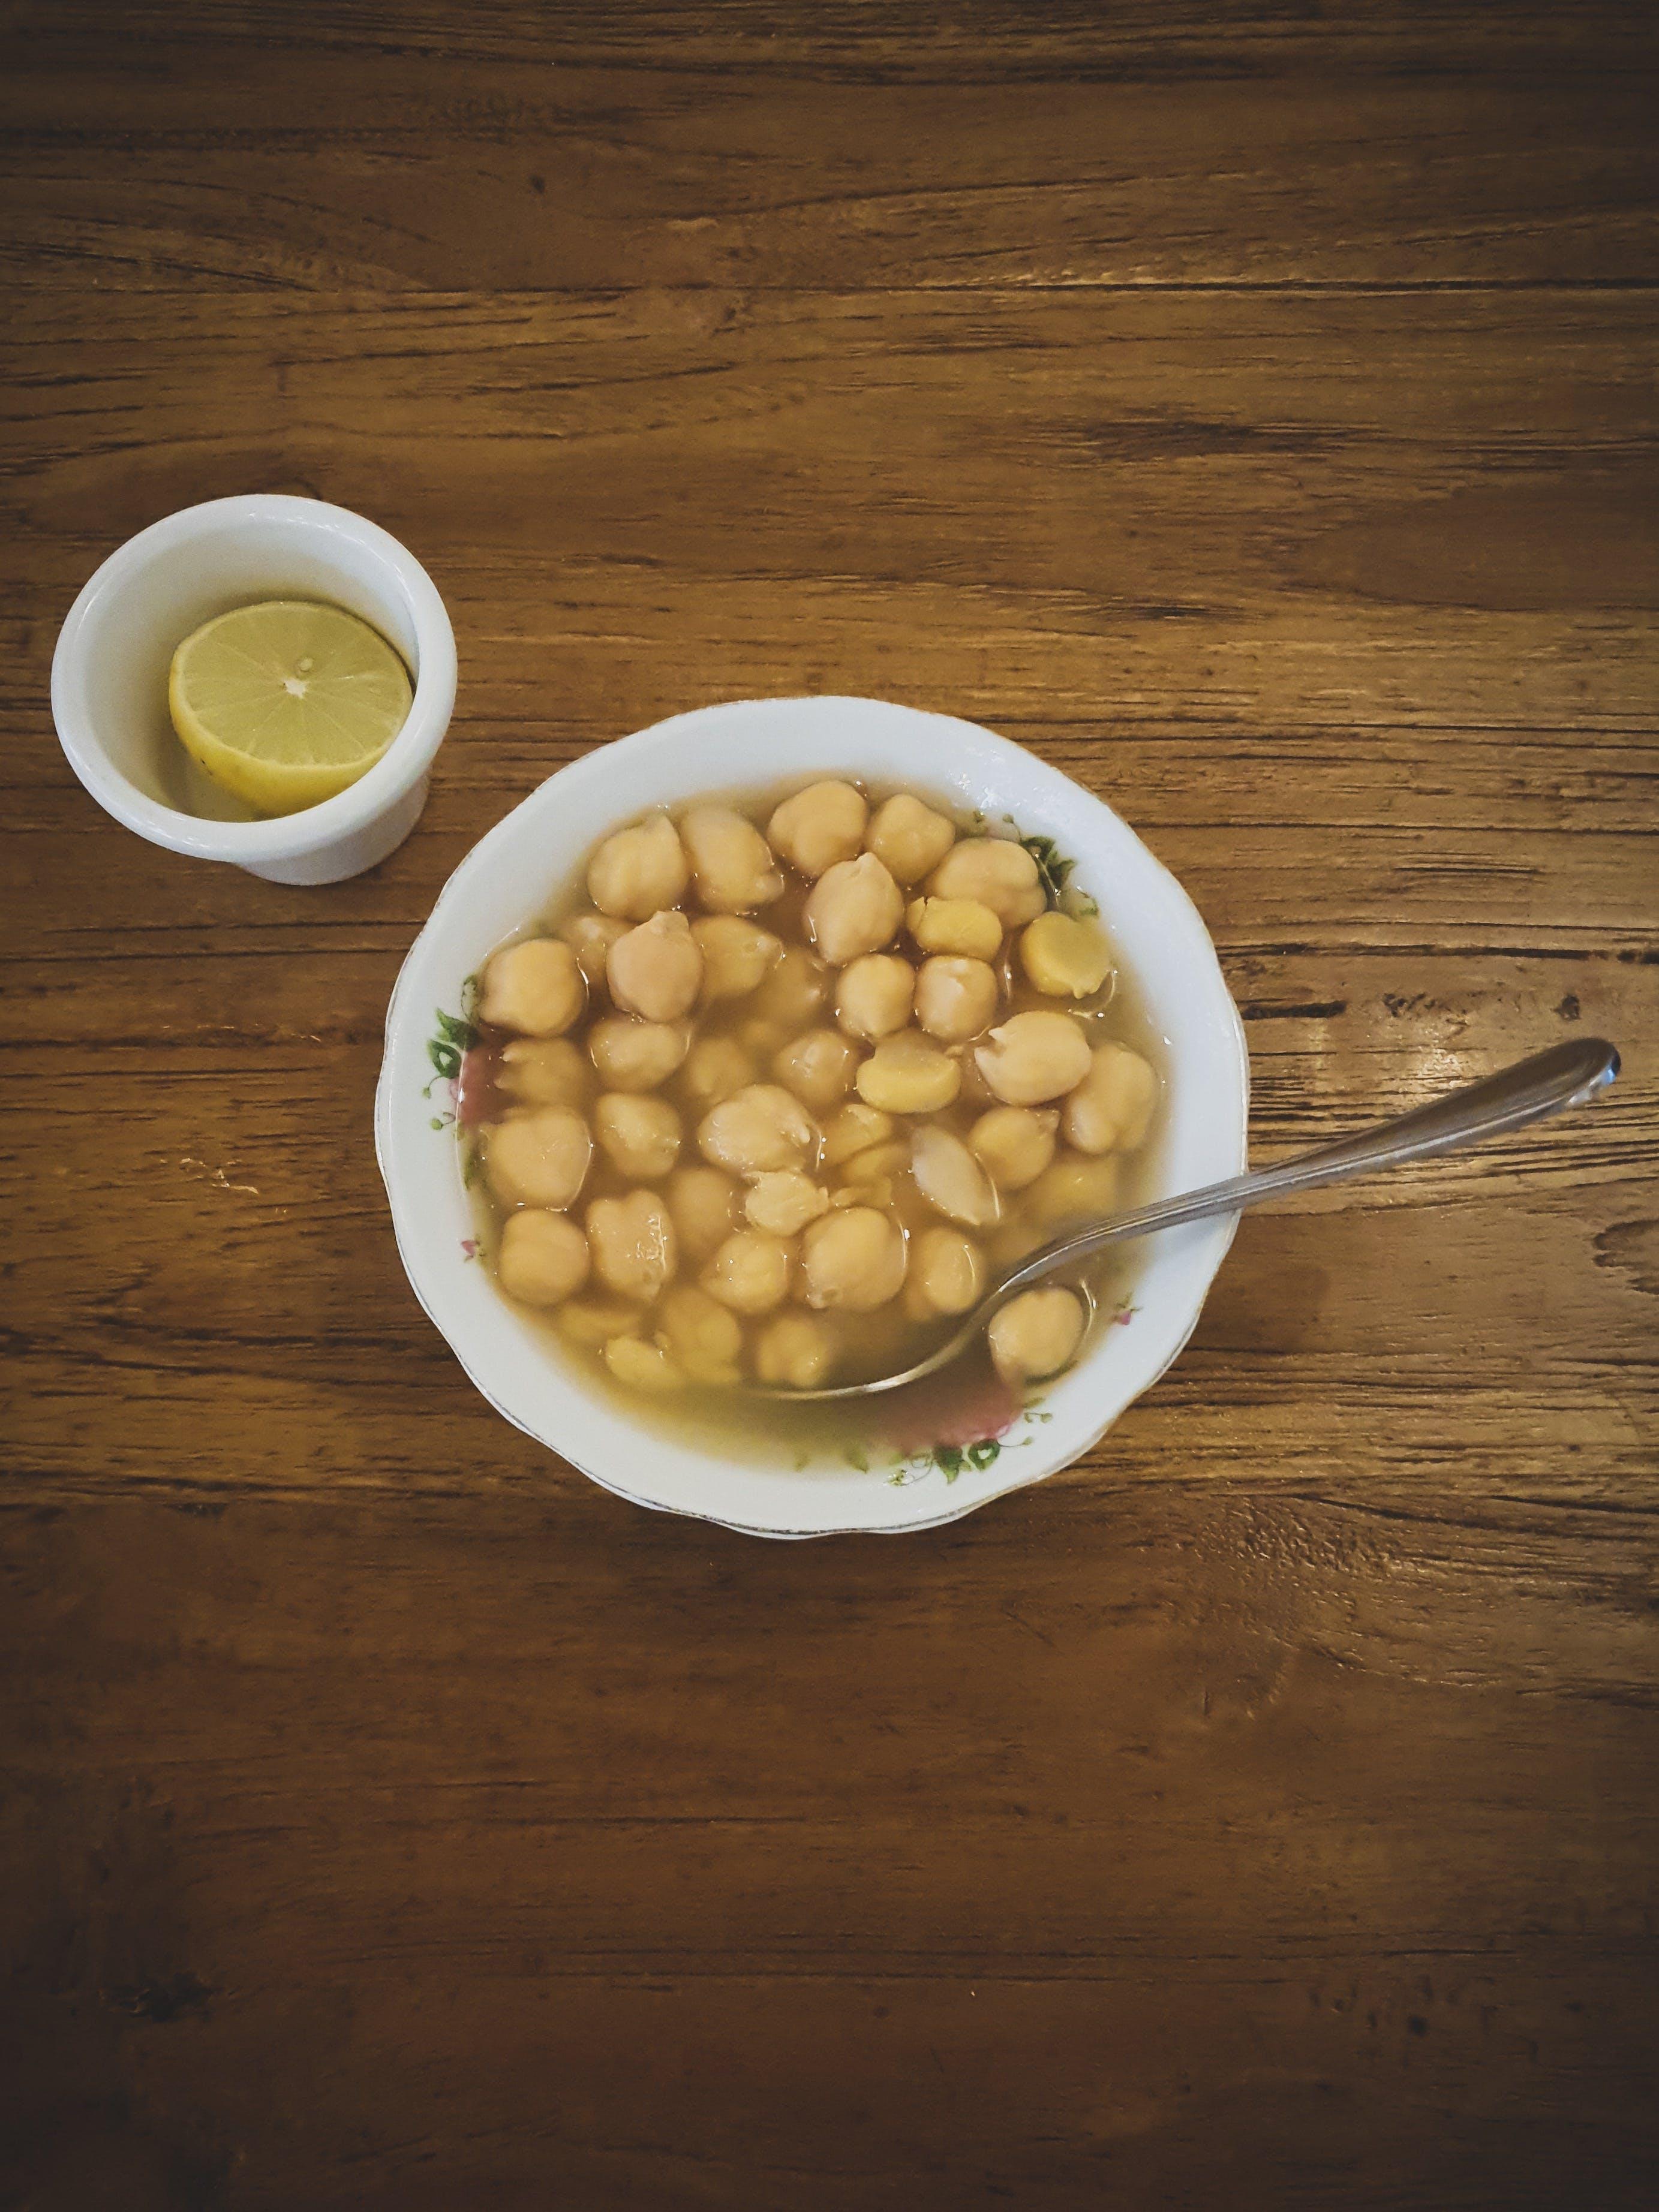 Free stock photo of foods, arabic, likes, Arabic foods